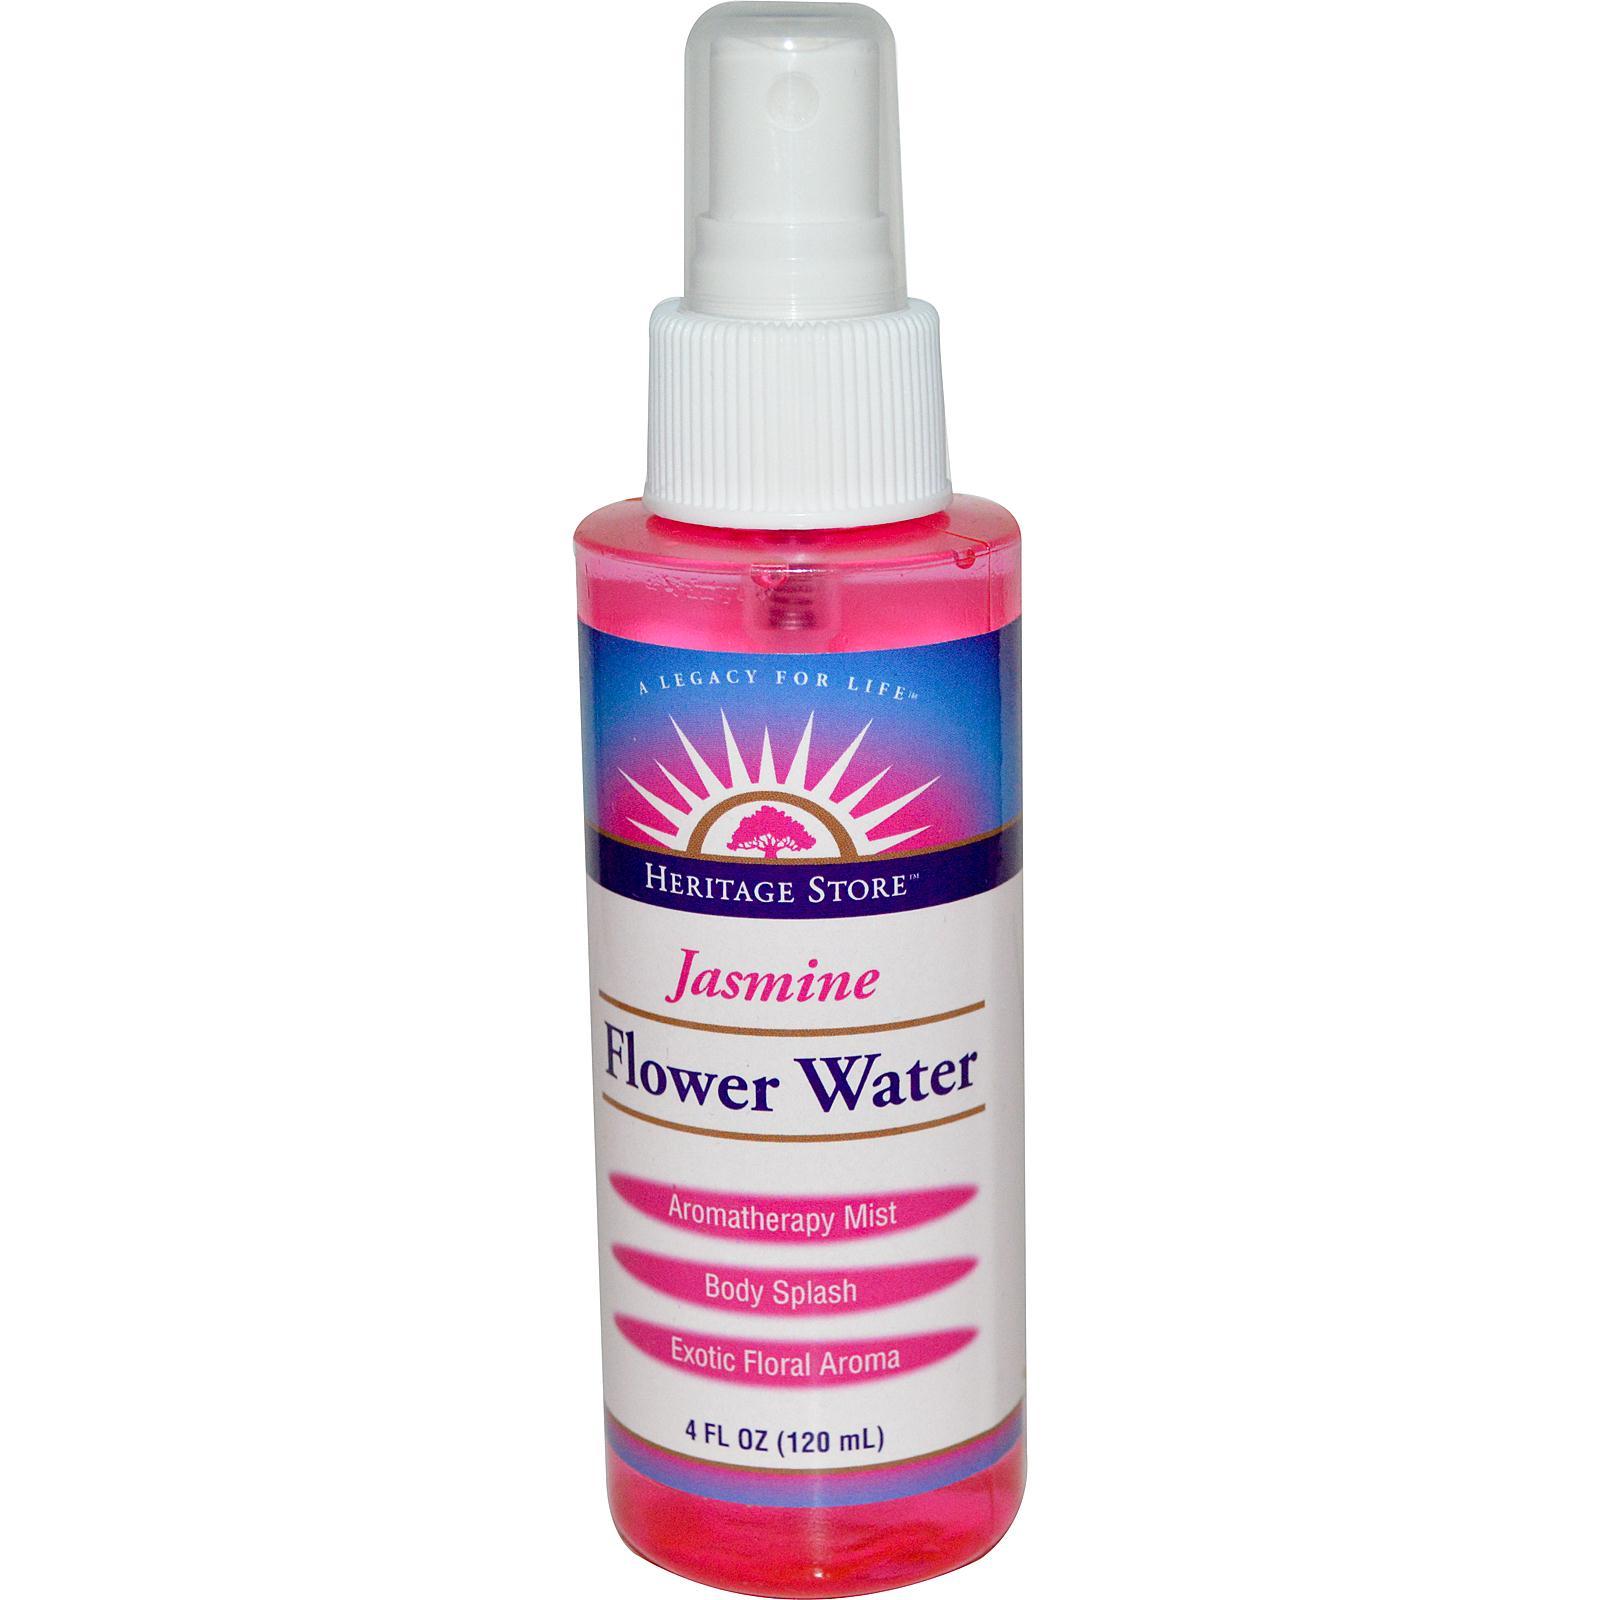 Heritage Store Jasmine Flower Water  4oz 120ml